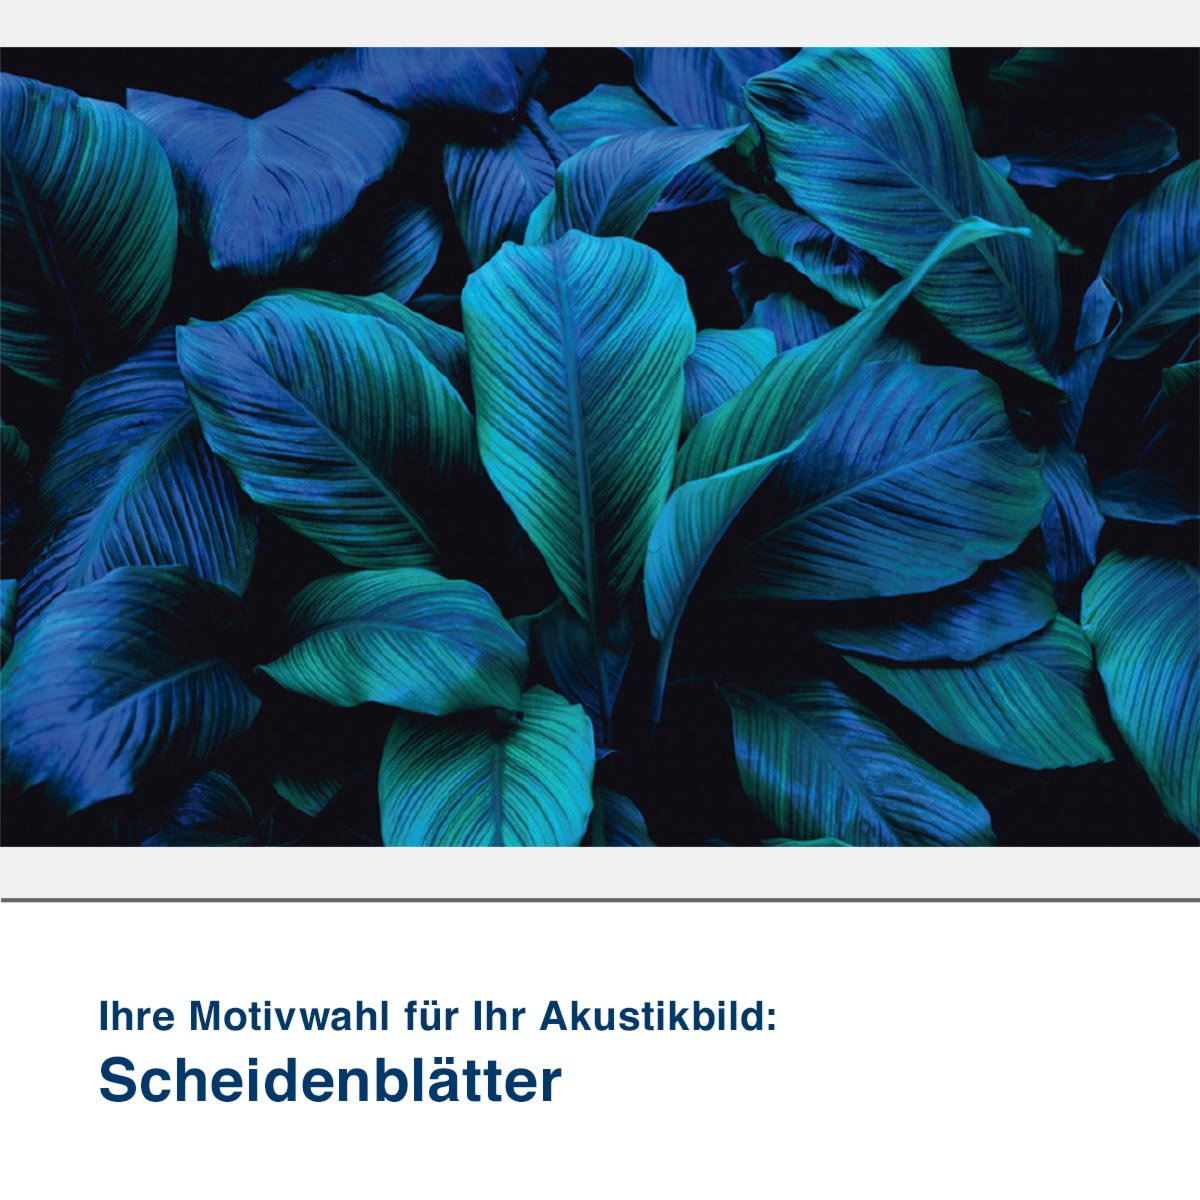 Akustikbild Motiv Scheidenblätter